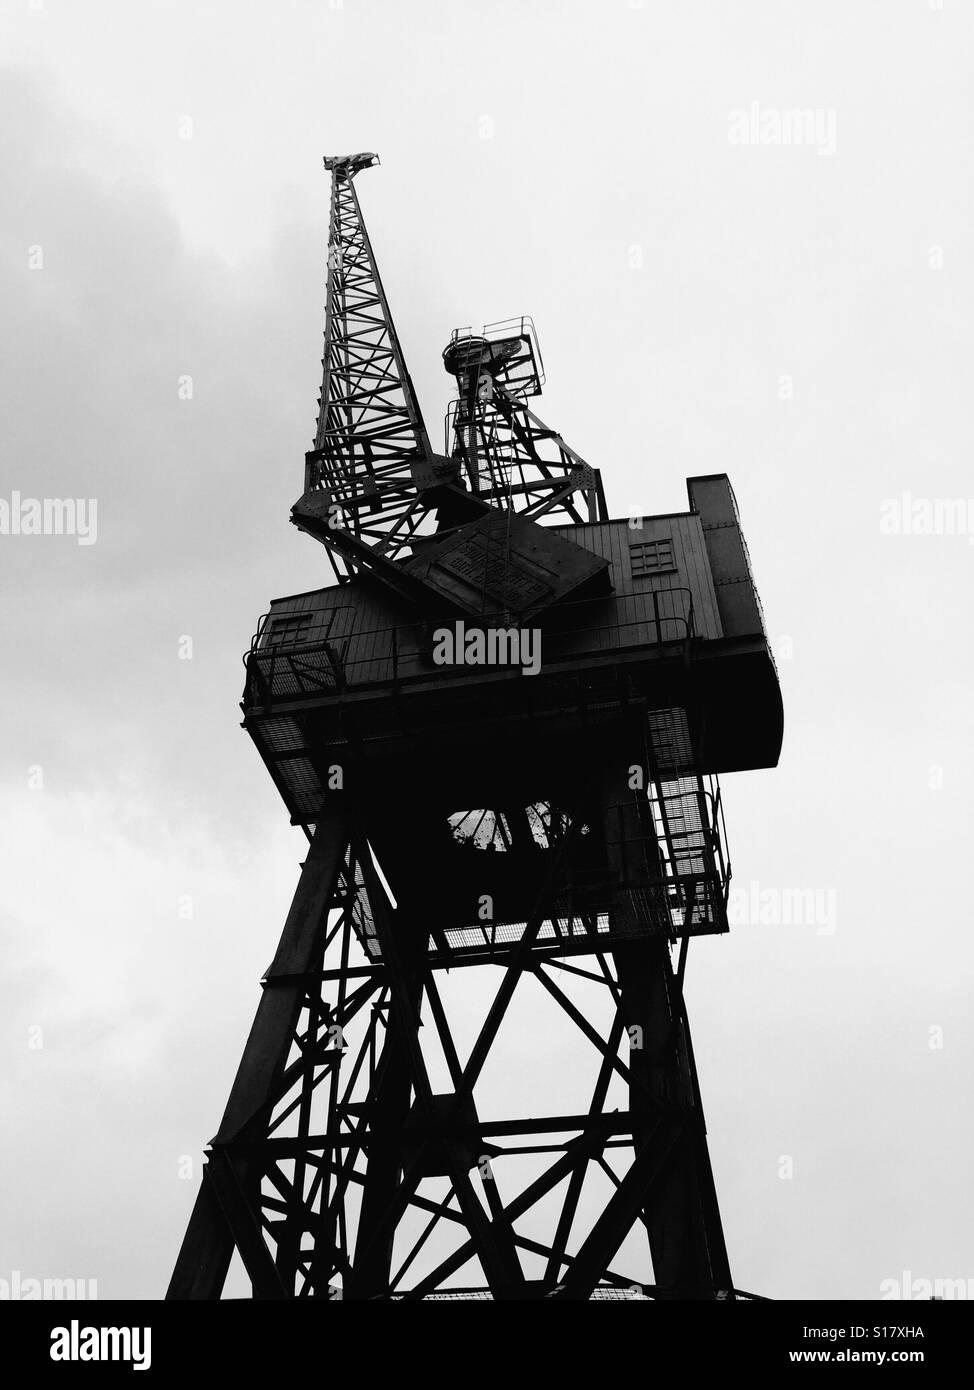 Docklands Crane - Stock Image